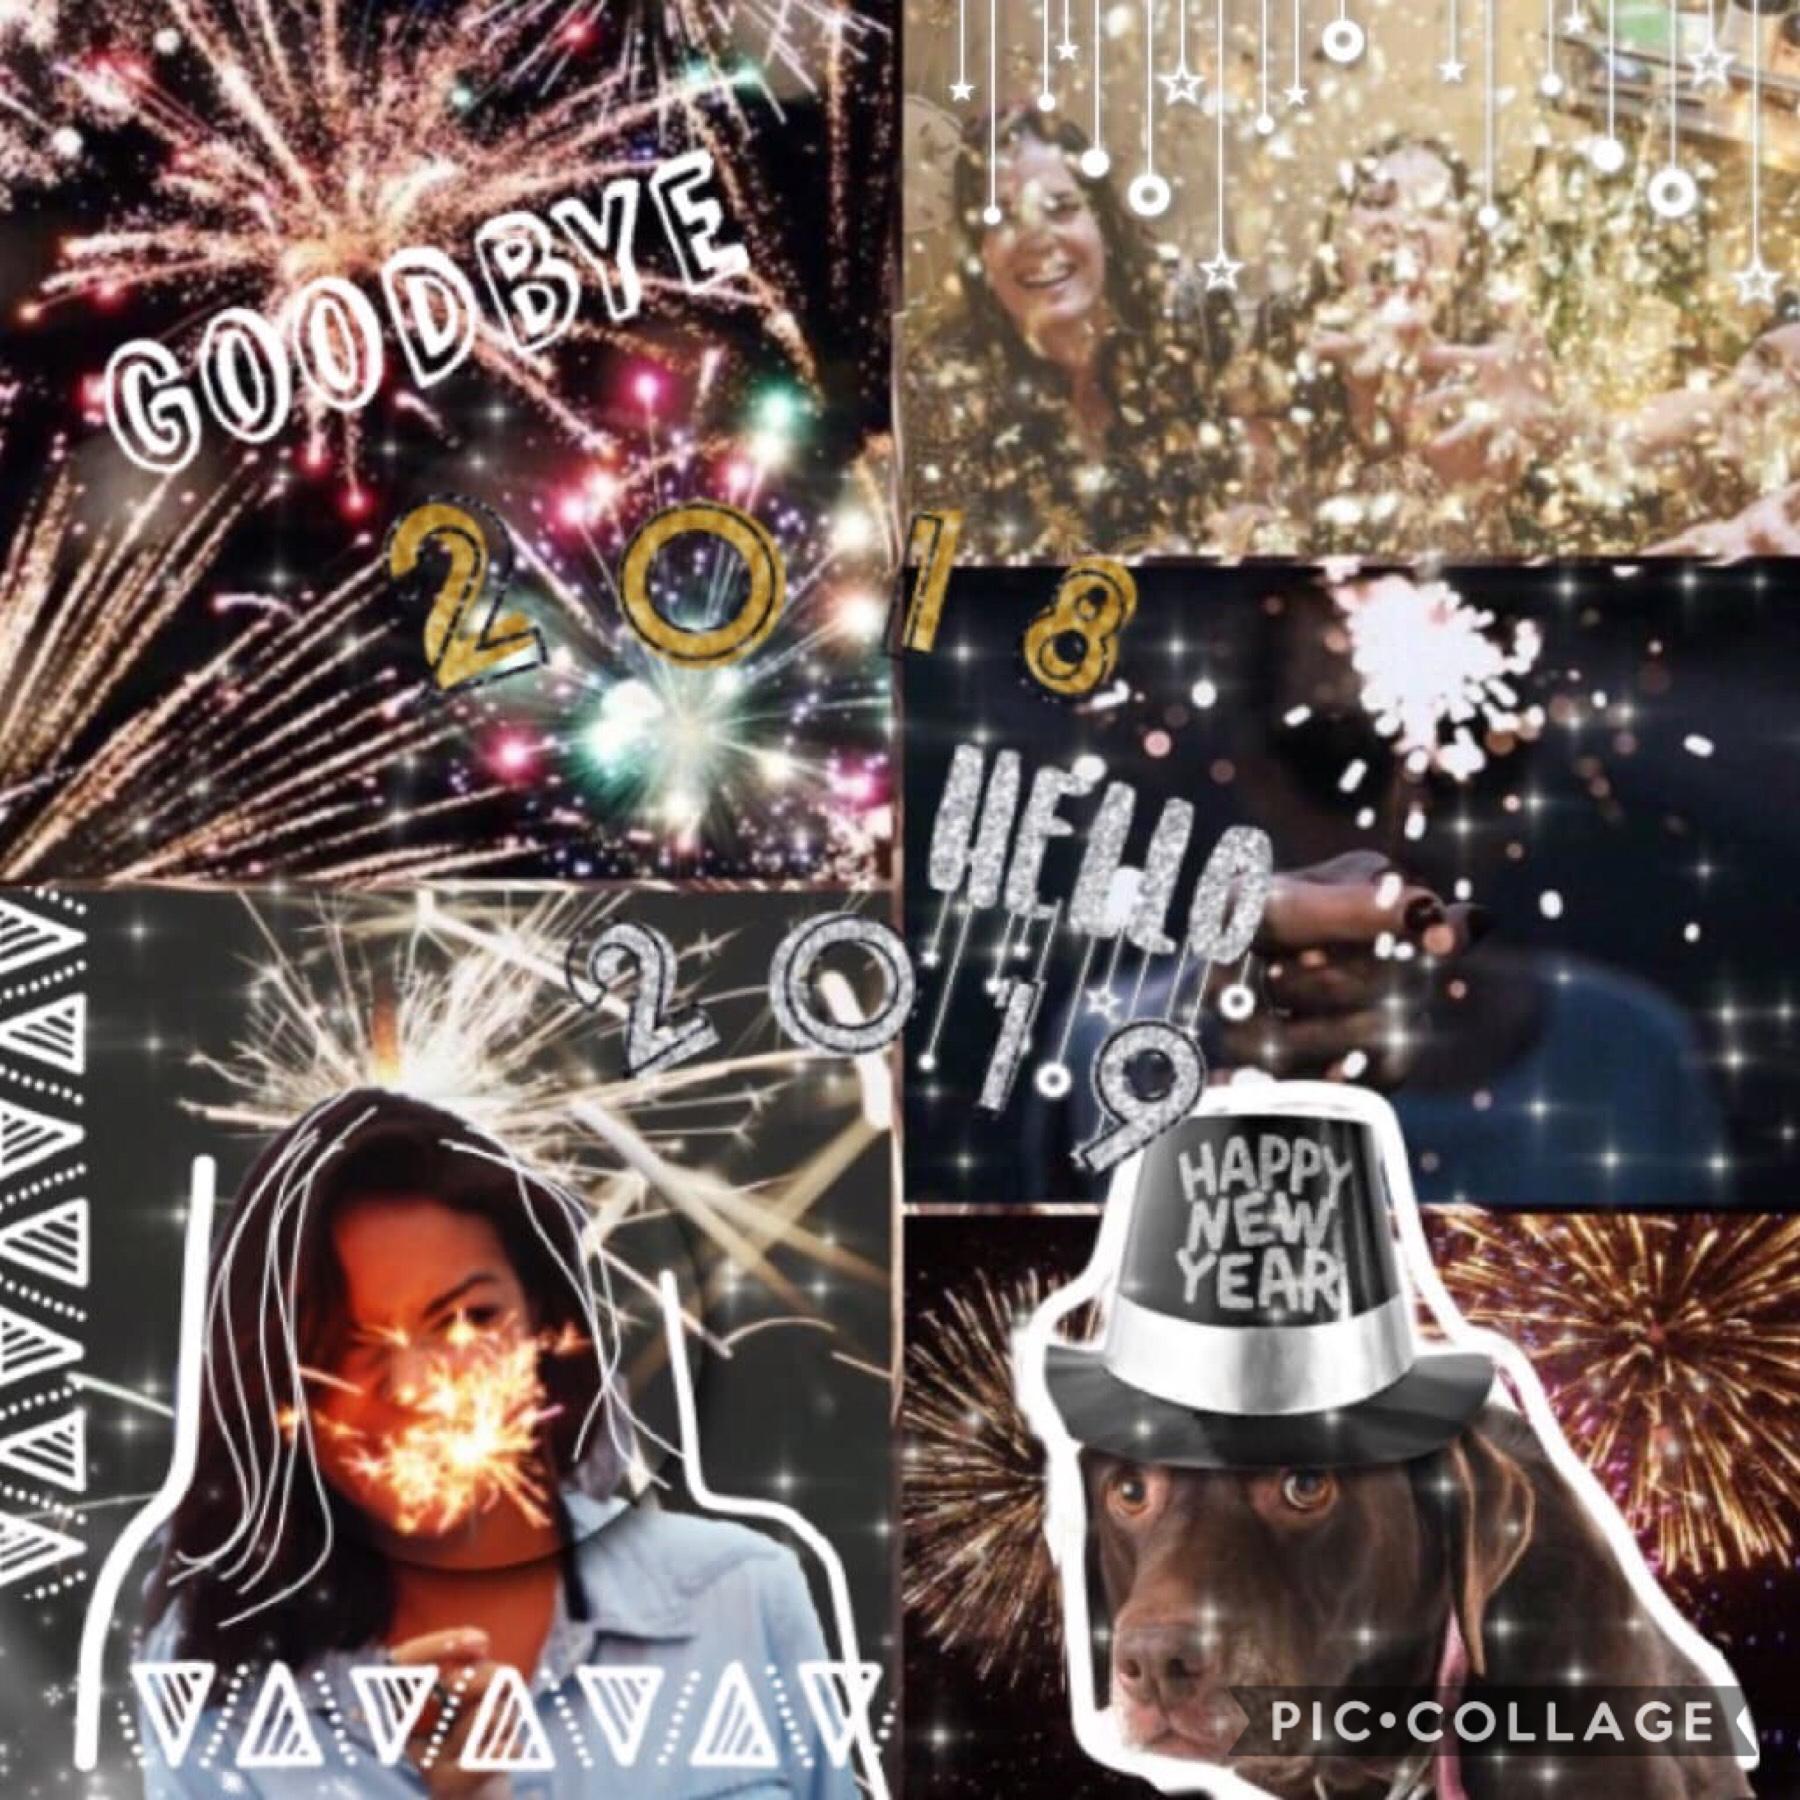 Happy 🎉 New 🎉 Year 🎉!!!!